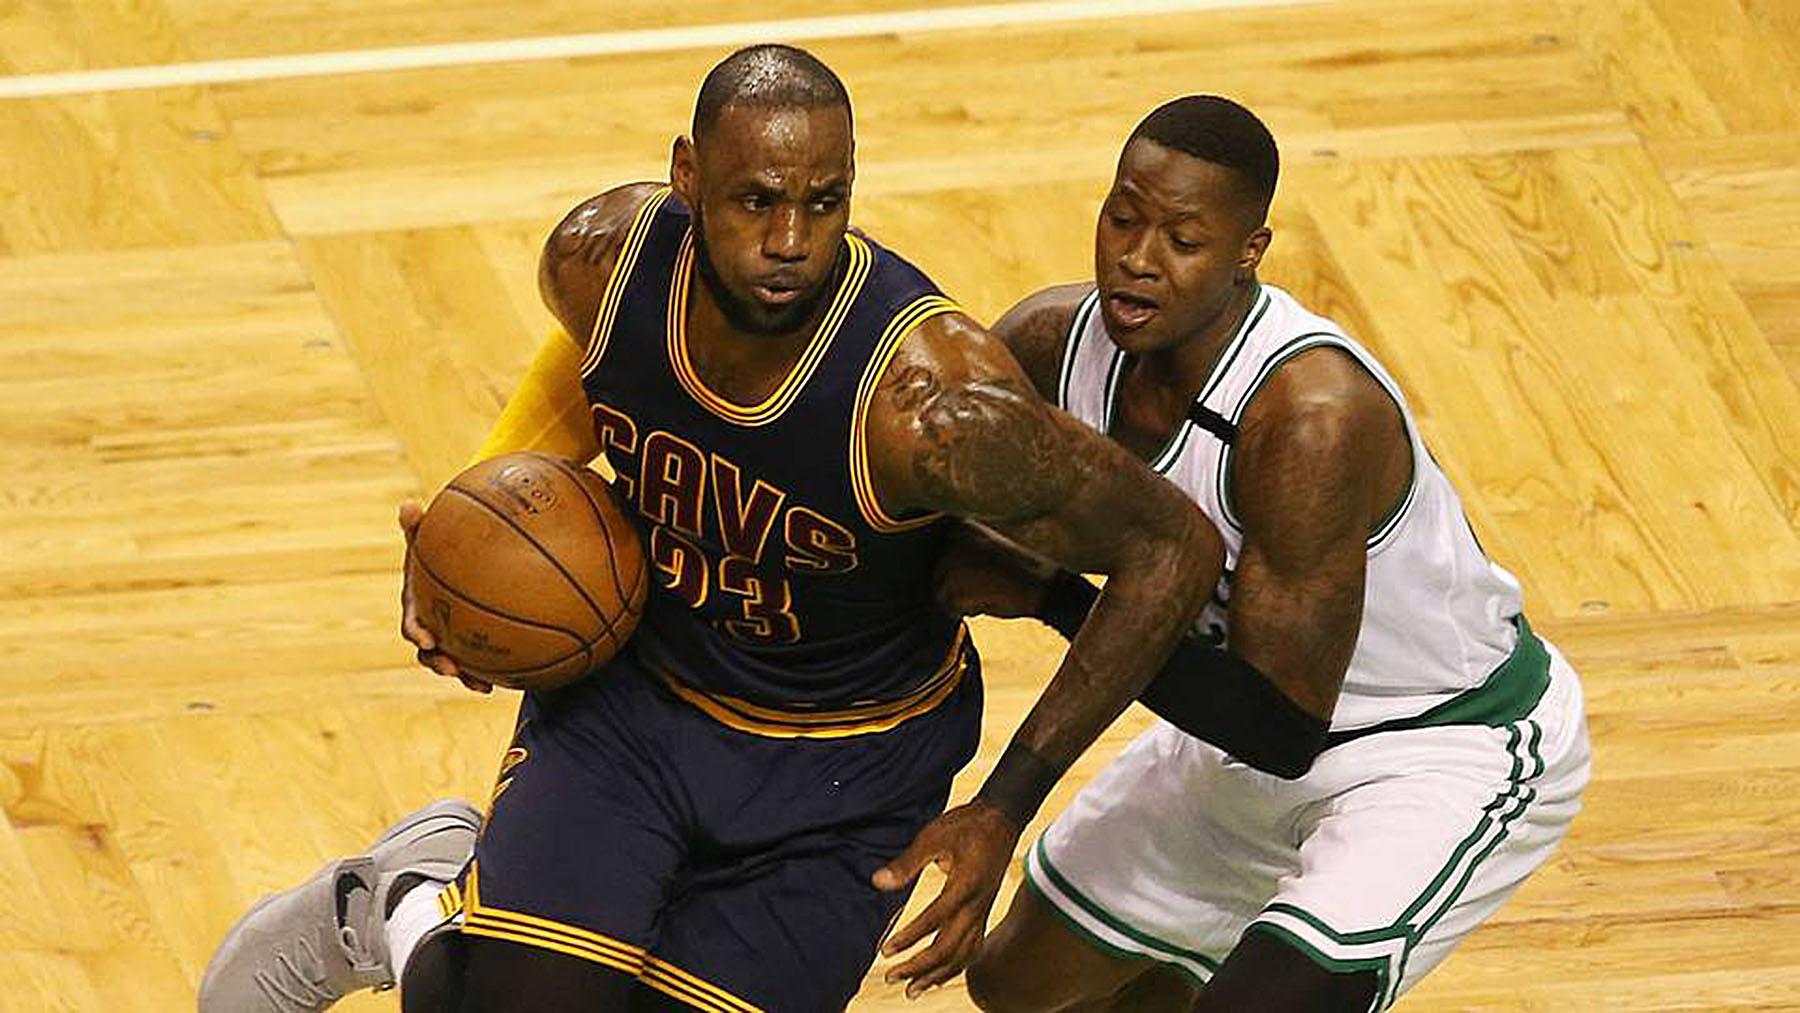 LeBron James Passes Michael Jordan As All-Time NBA Playoff Scoring Leader